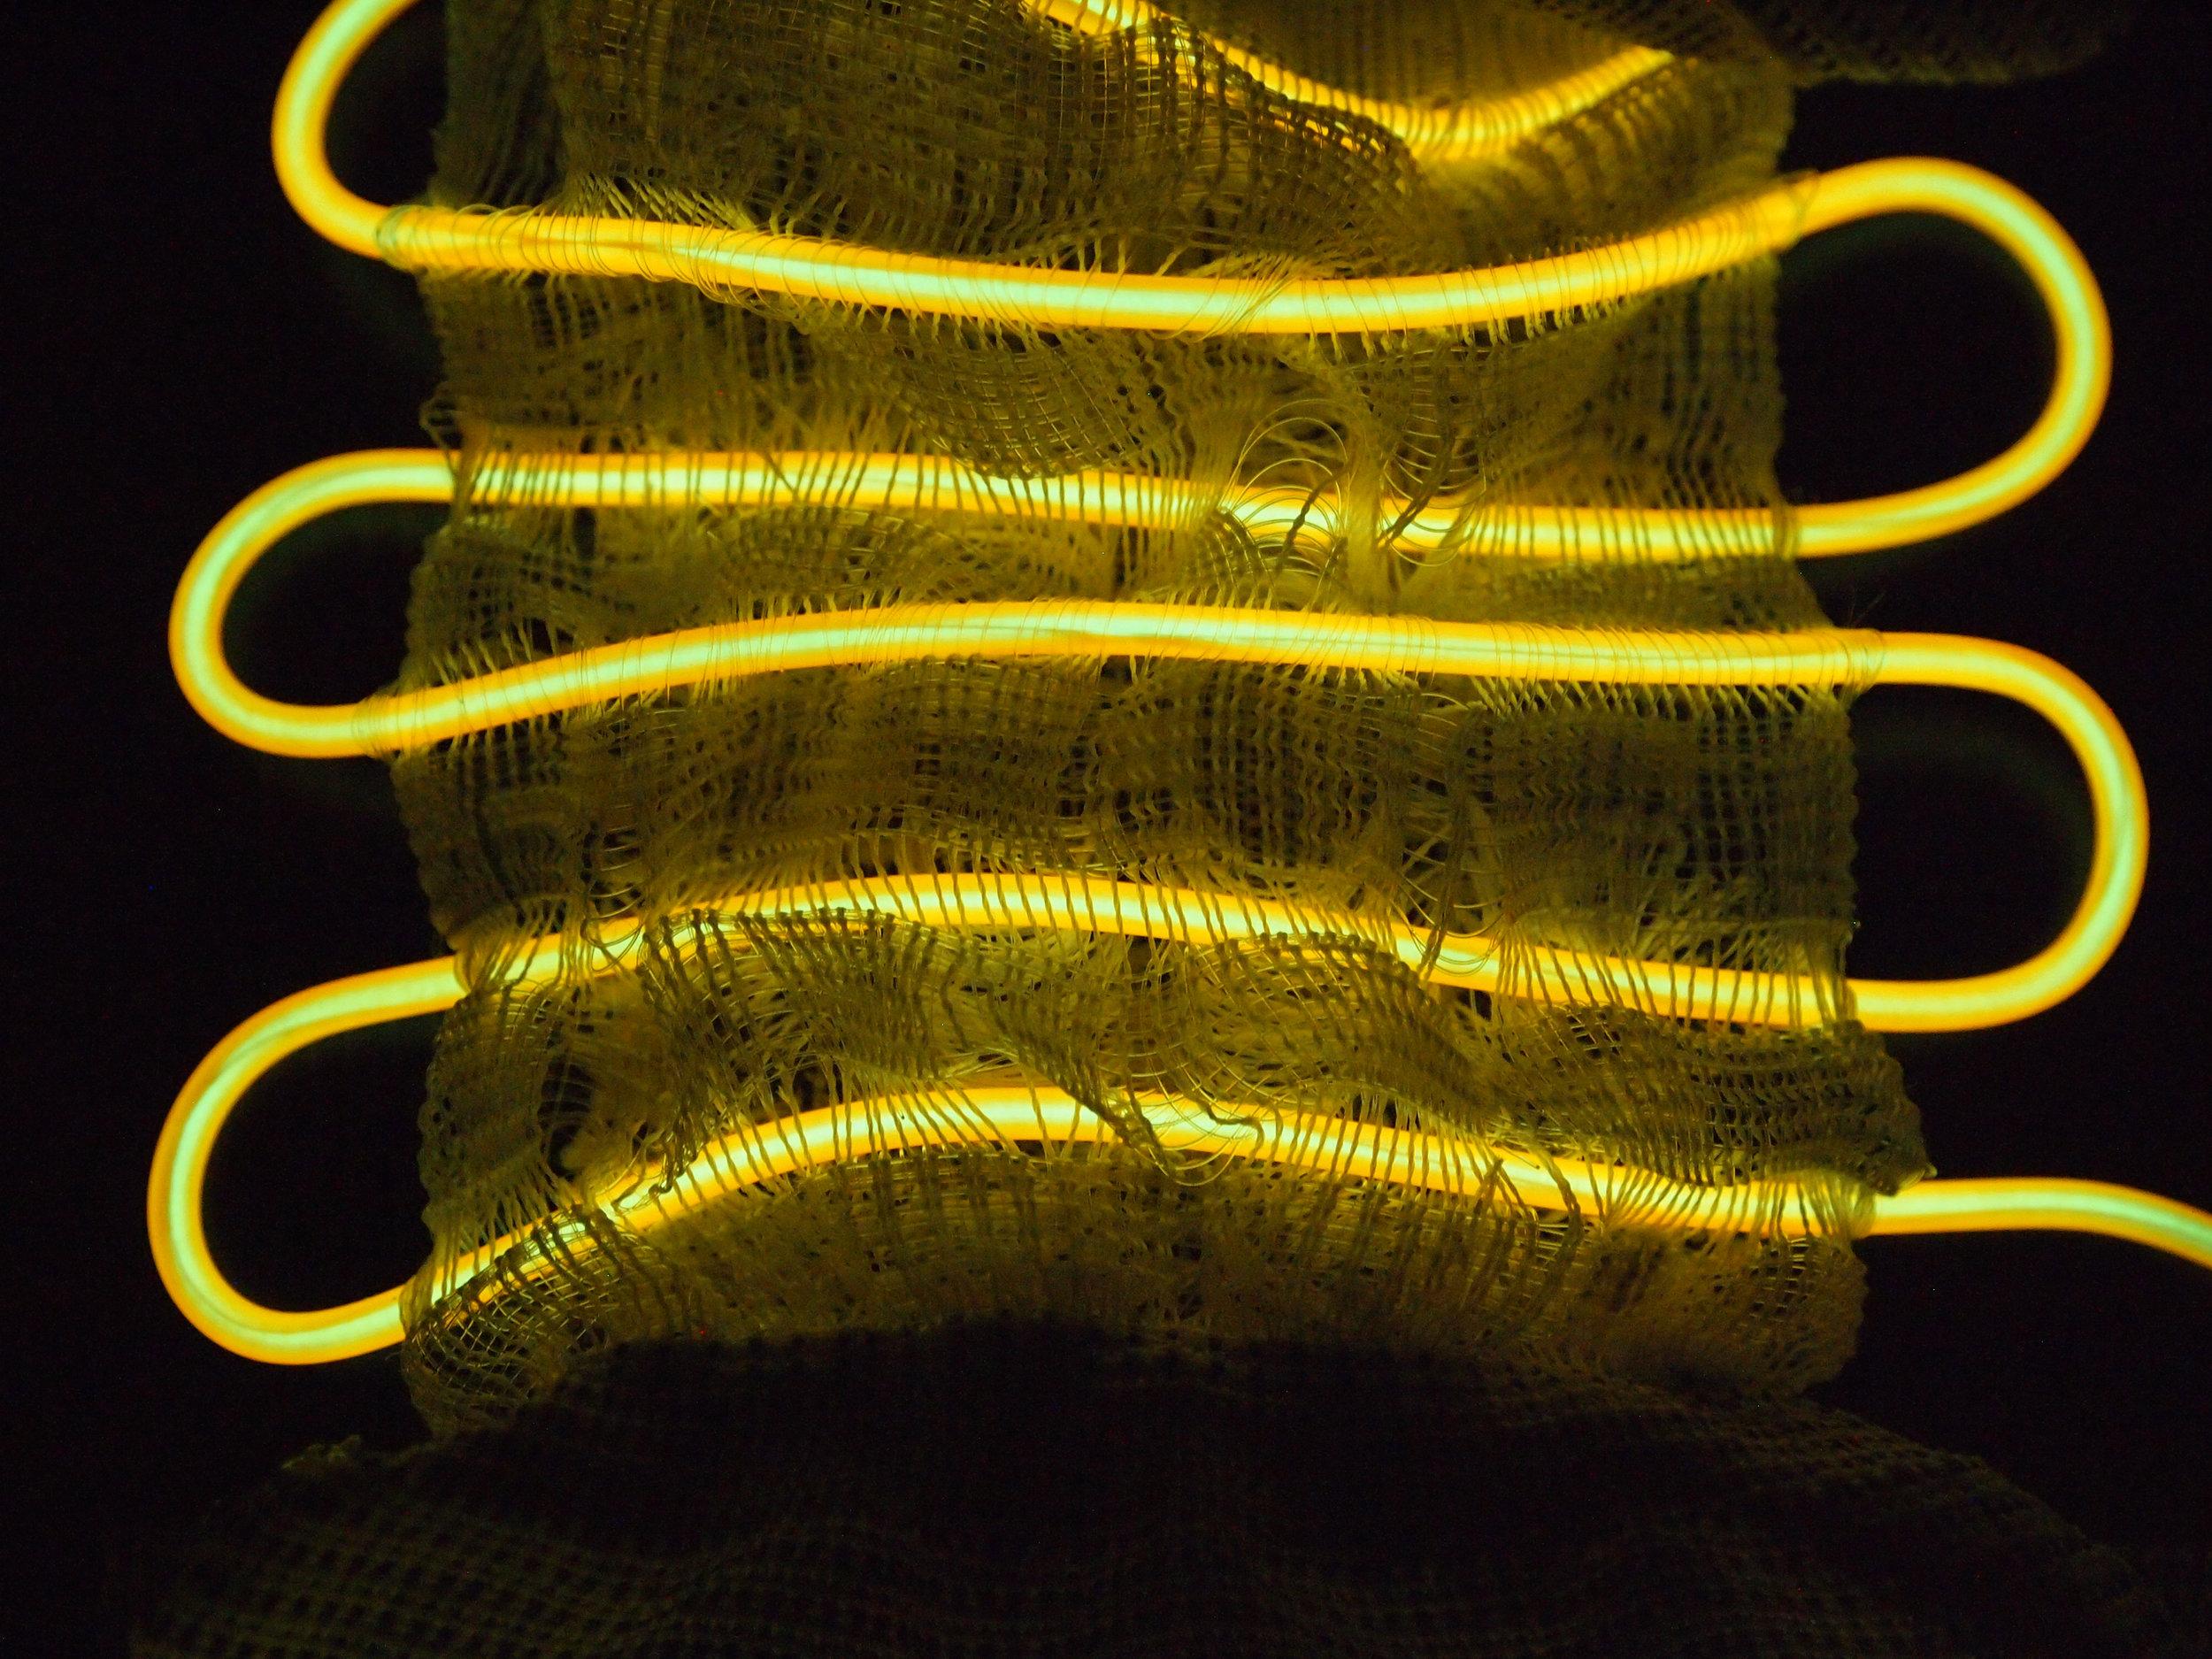 Hand Woven  Nylon Thread, Nylon Elastic,Monofilament, LED Wire